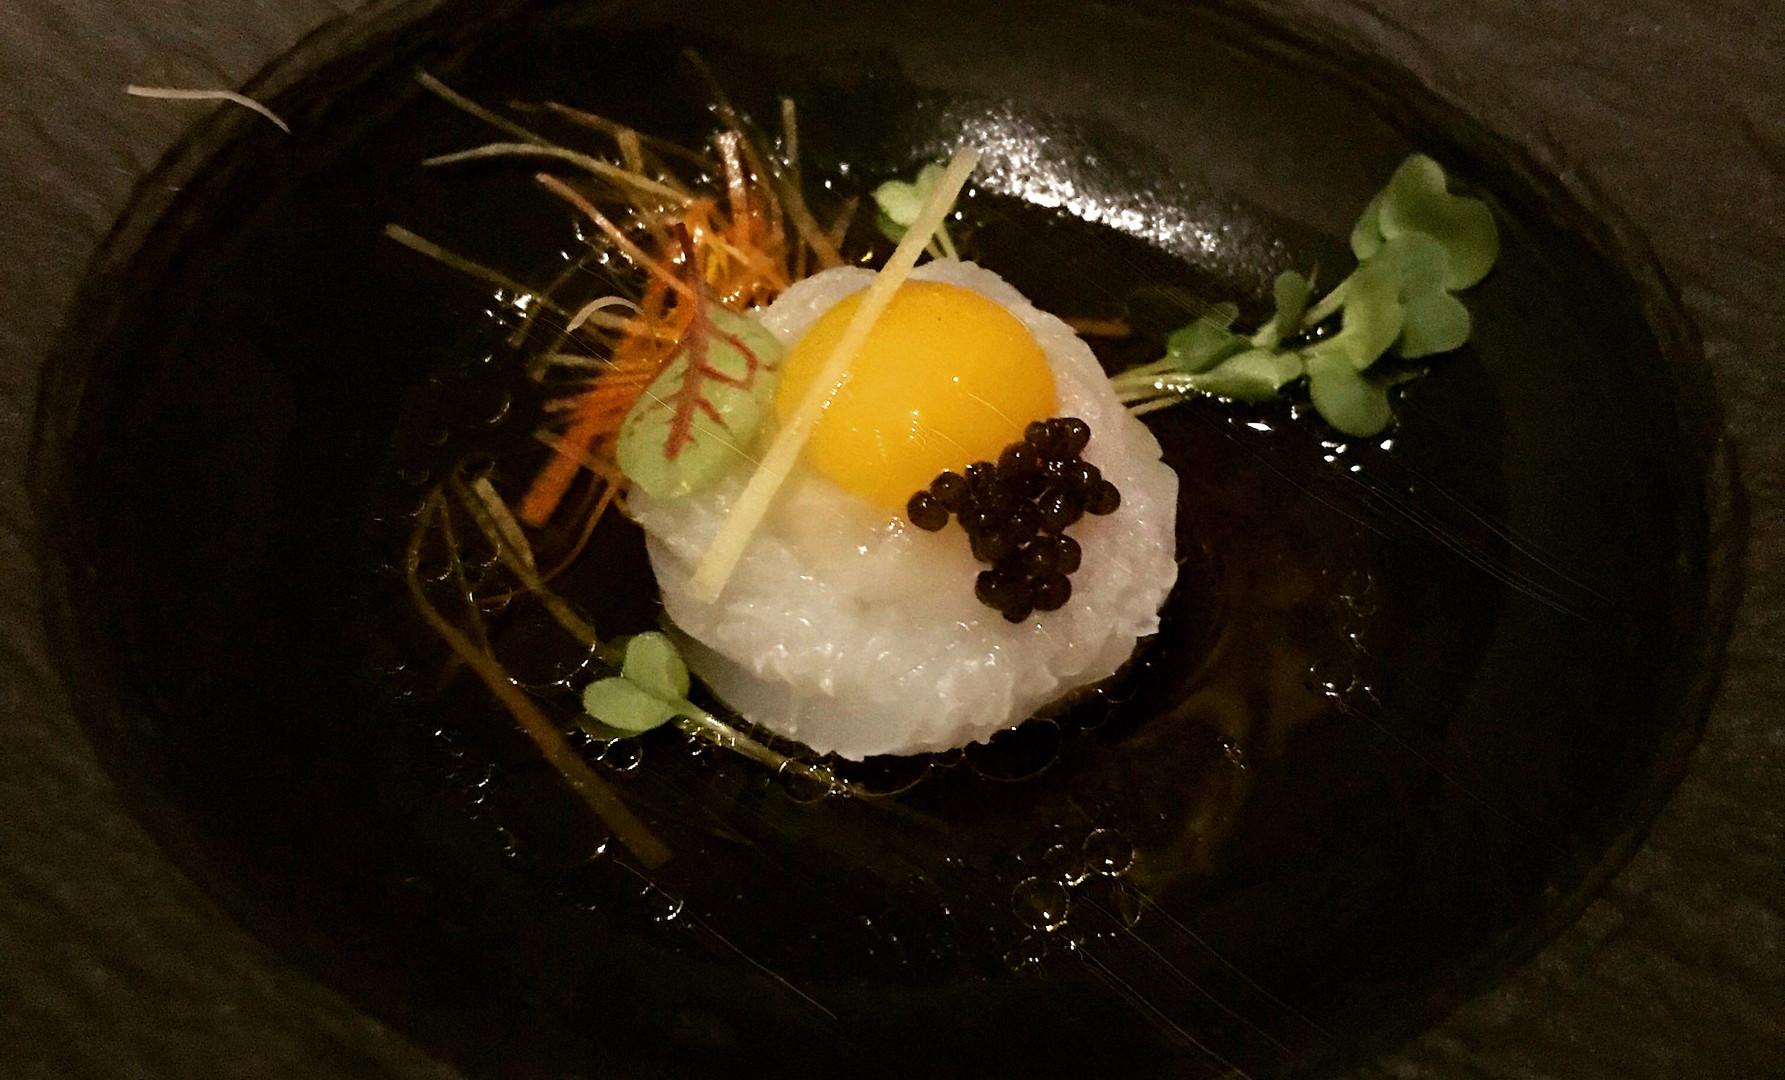 Ika Somen- Crudo di calamaro sfrangiato, caviale Kaluga Amur, verdure croccanti, uovo di quaglia